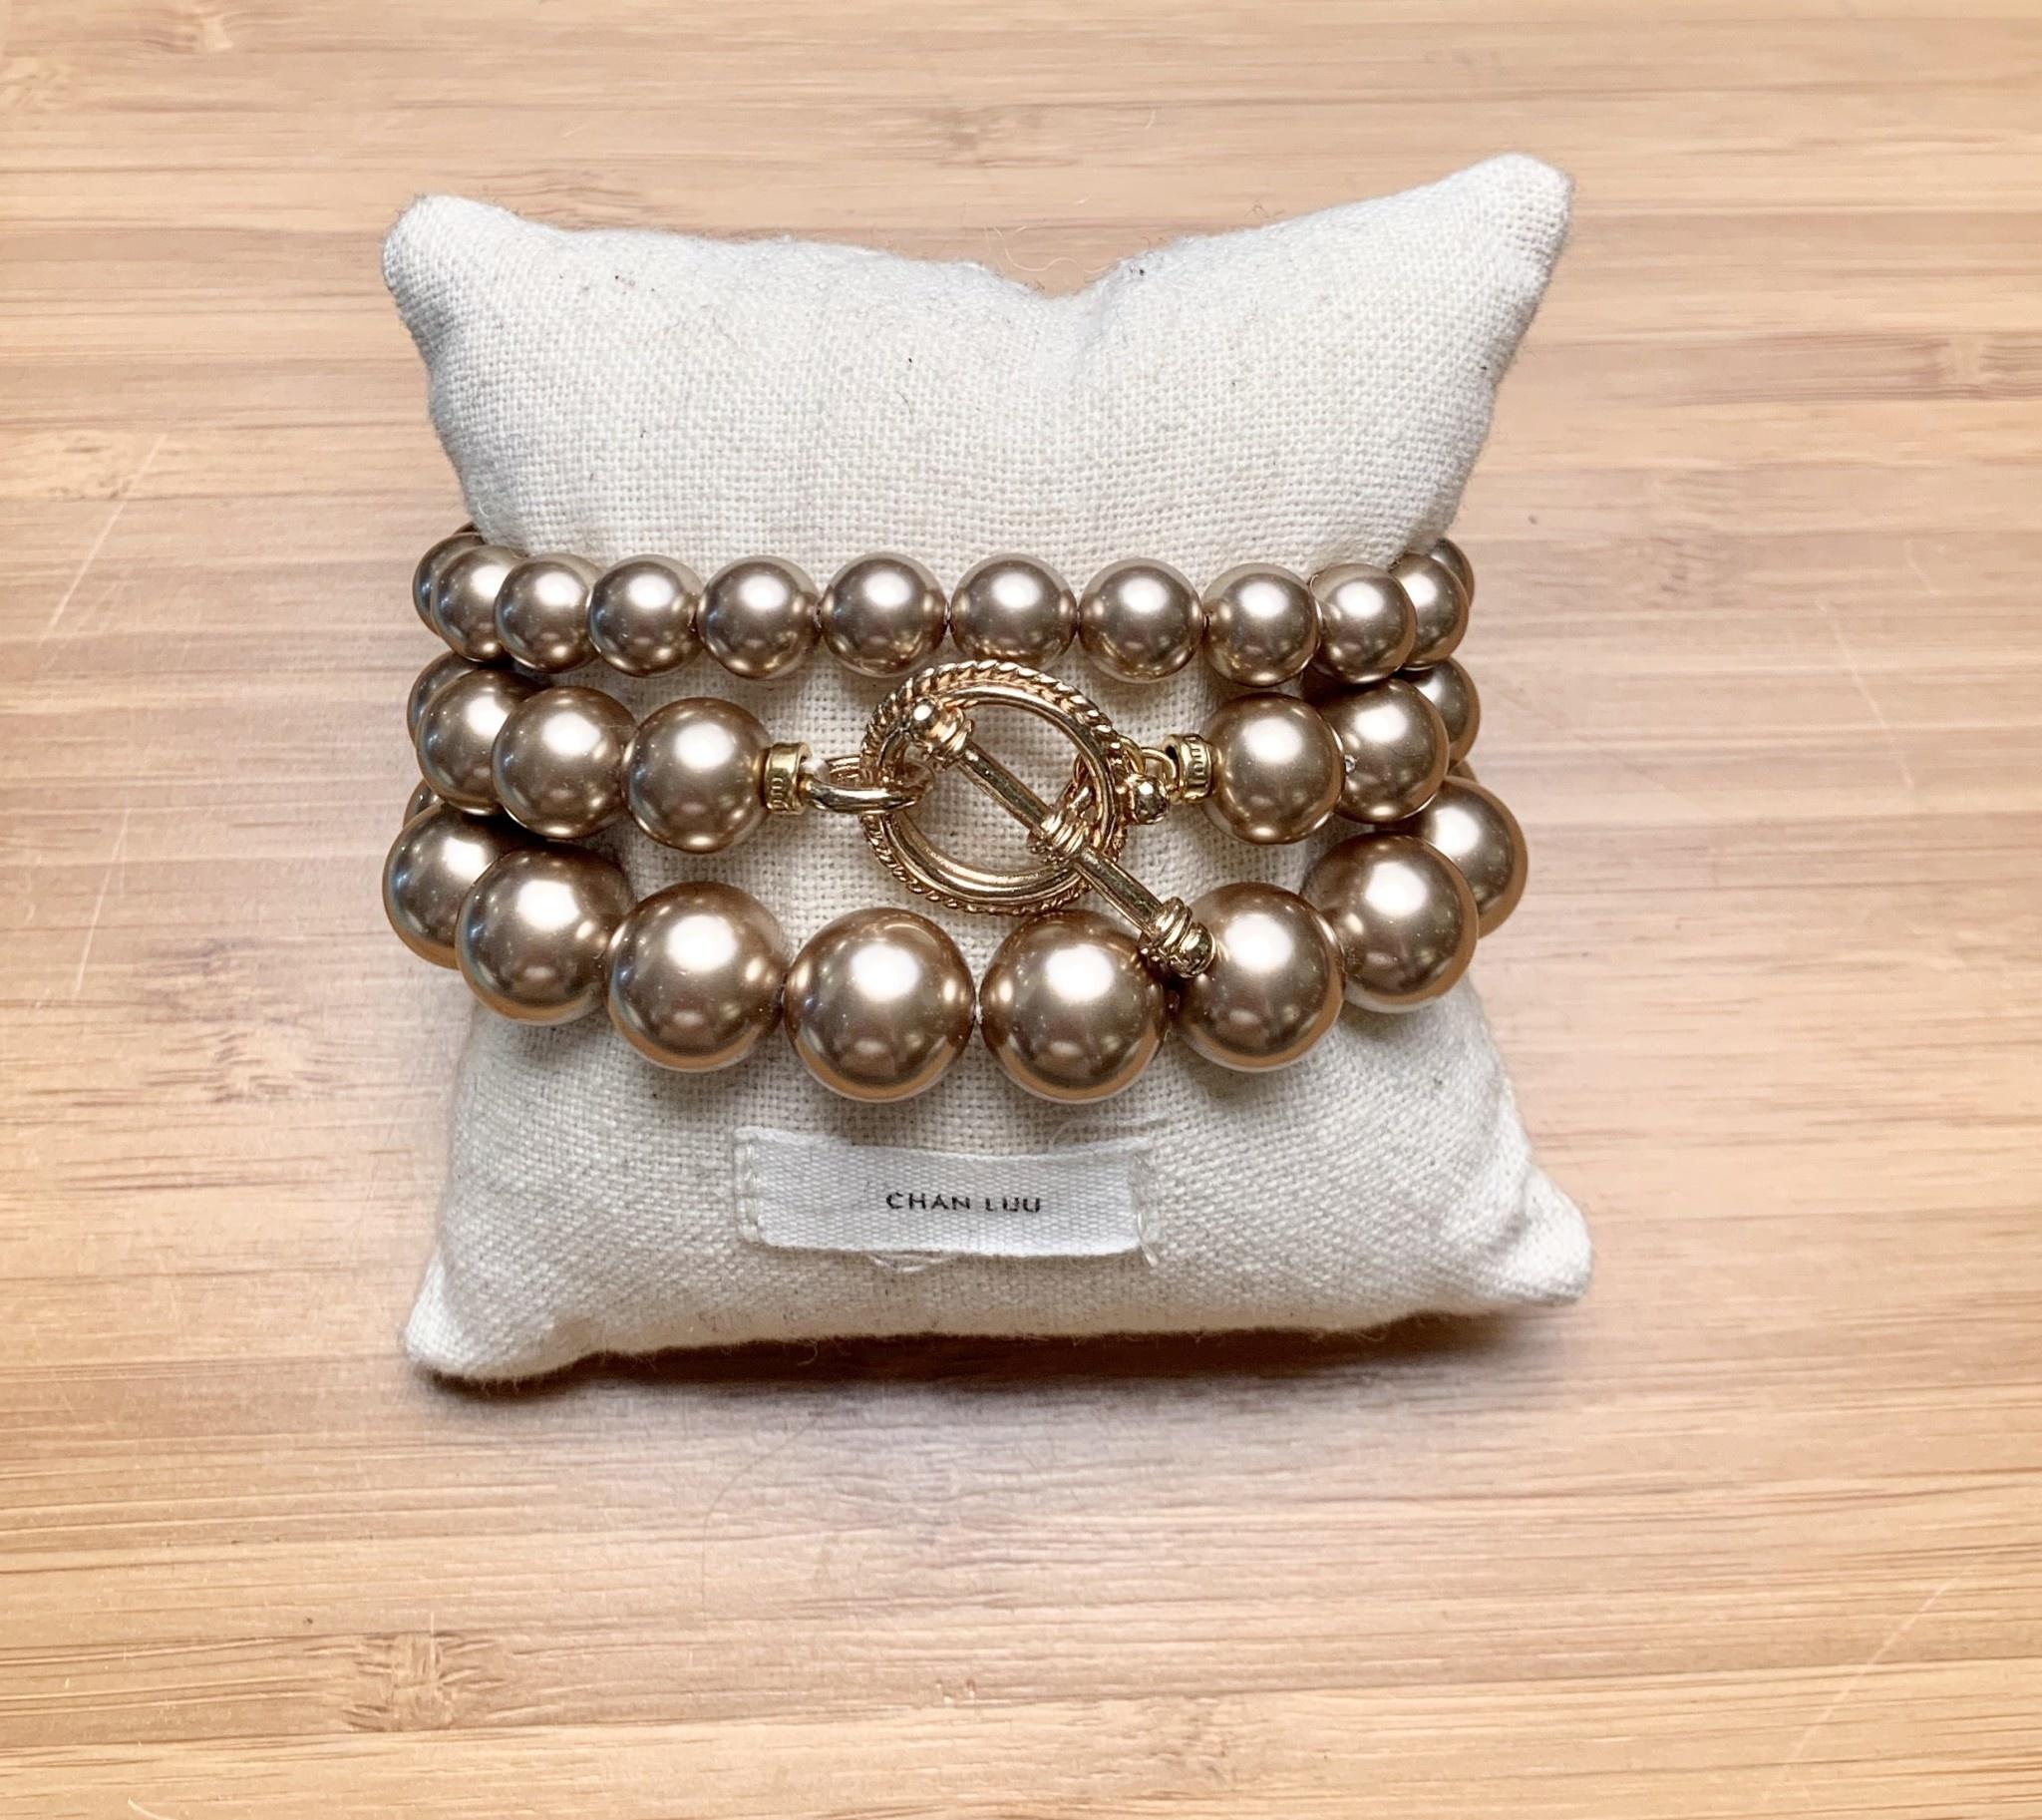 Chan Luu Holly Bracelet Set